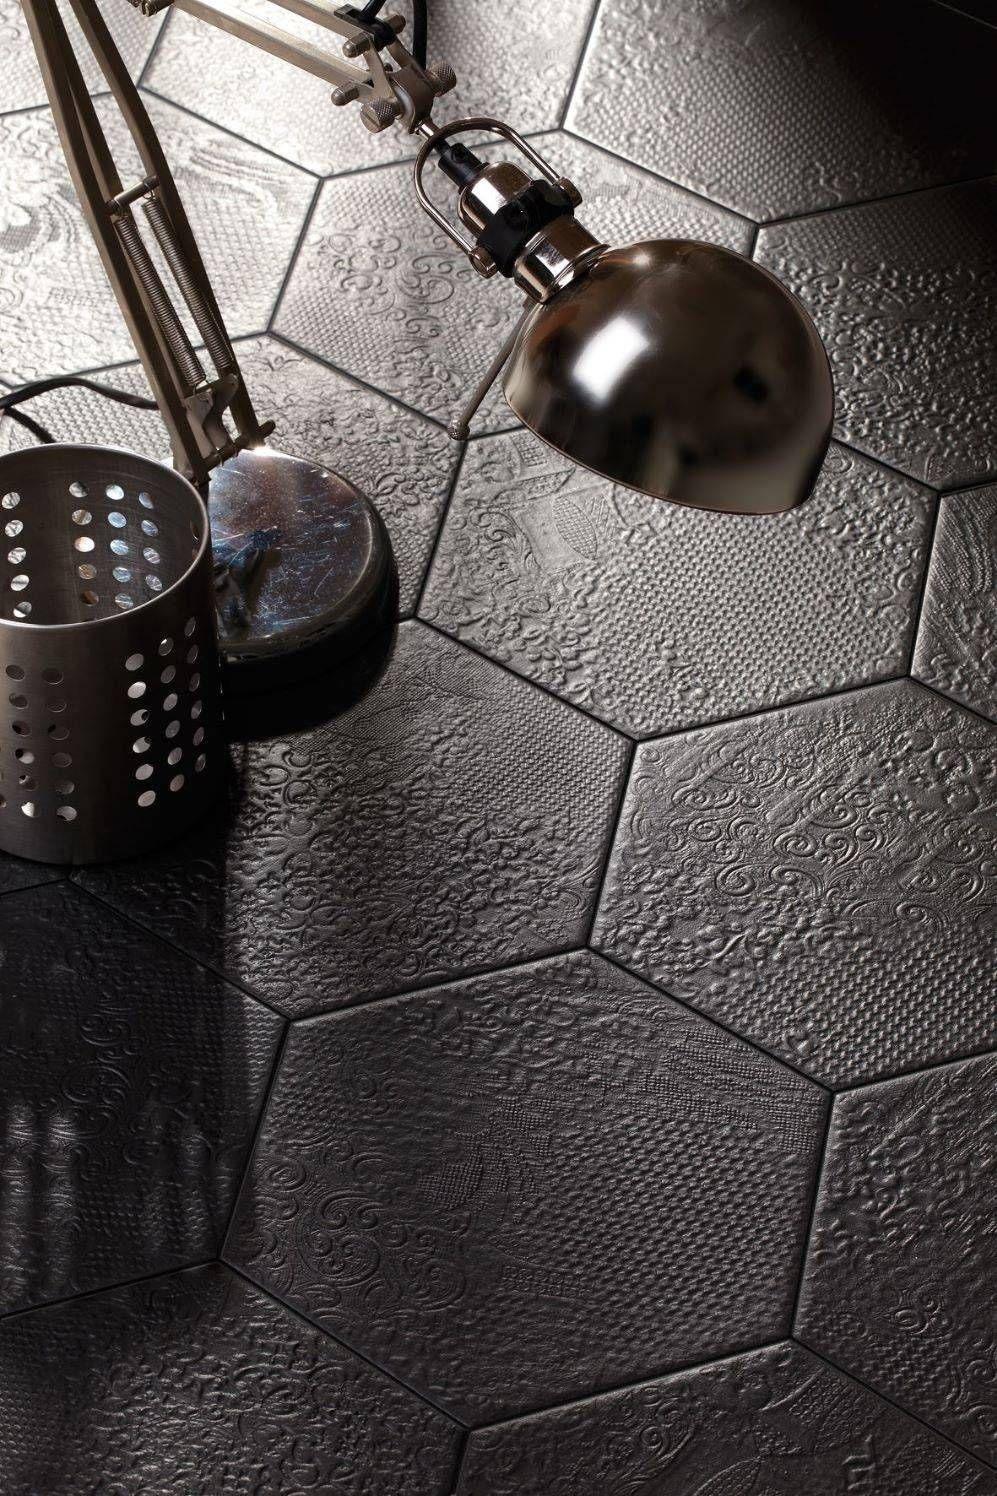 Epingle Par Salome Sur Bathroom Tuile Hexagonale Carrelage Hexagonal Carrelage